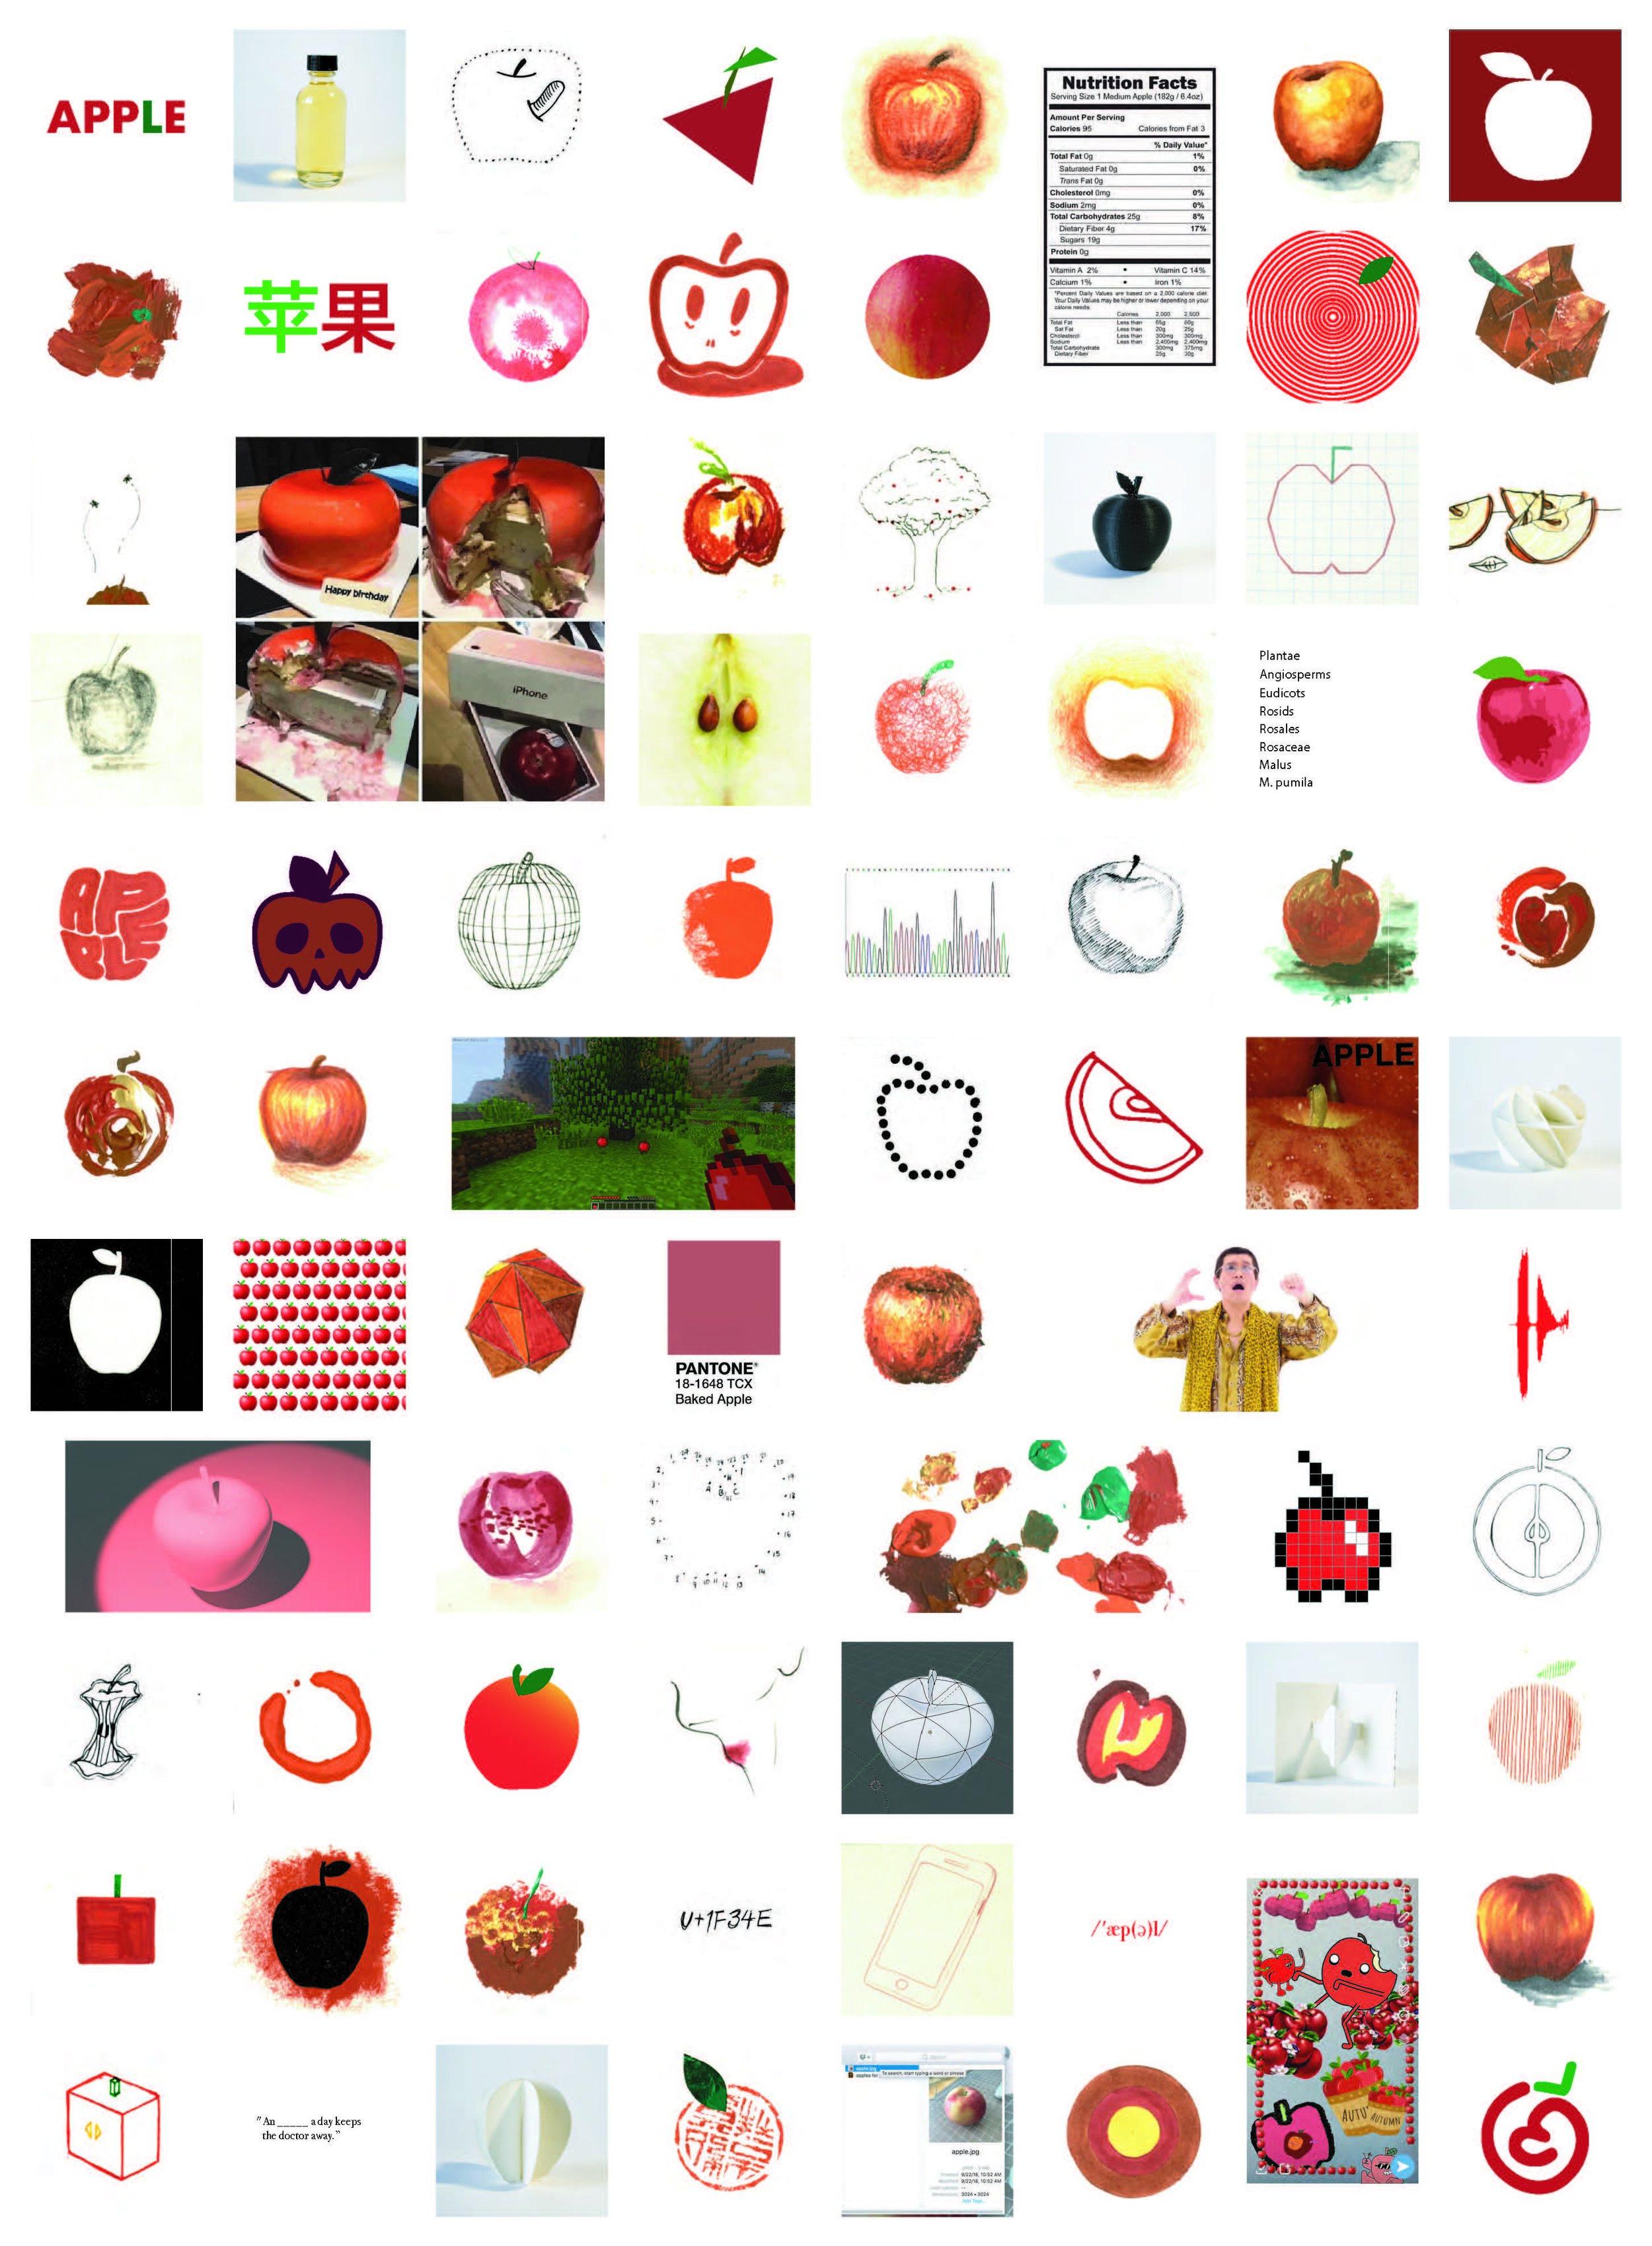 88 apples arranged.jpg